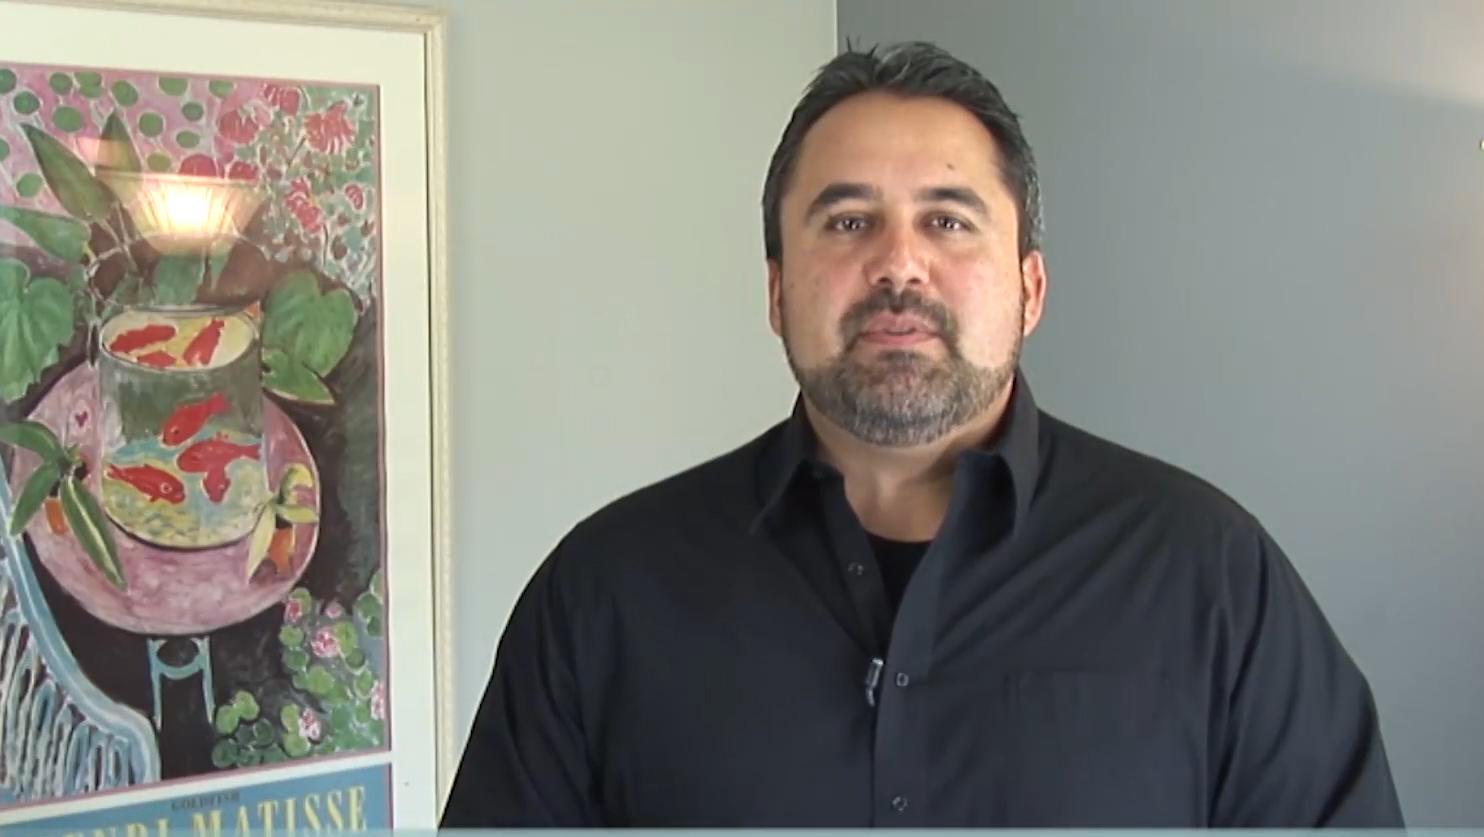 Armann Heshmati, M.A., L.M.F.T.; www.armannheshmati.com profile image